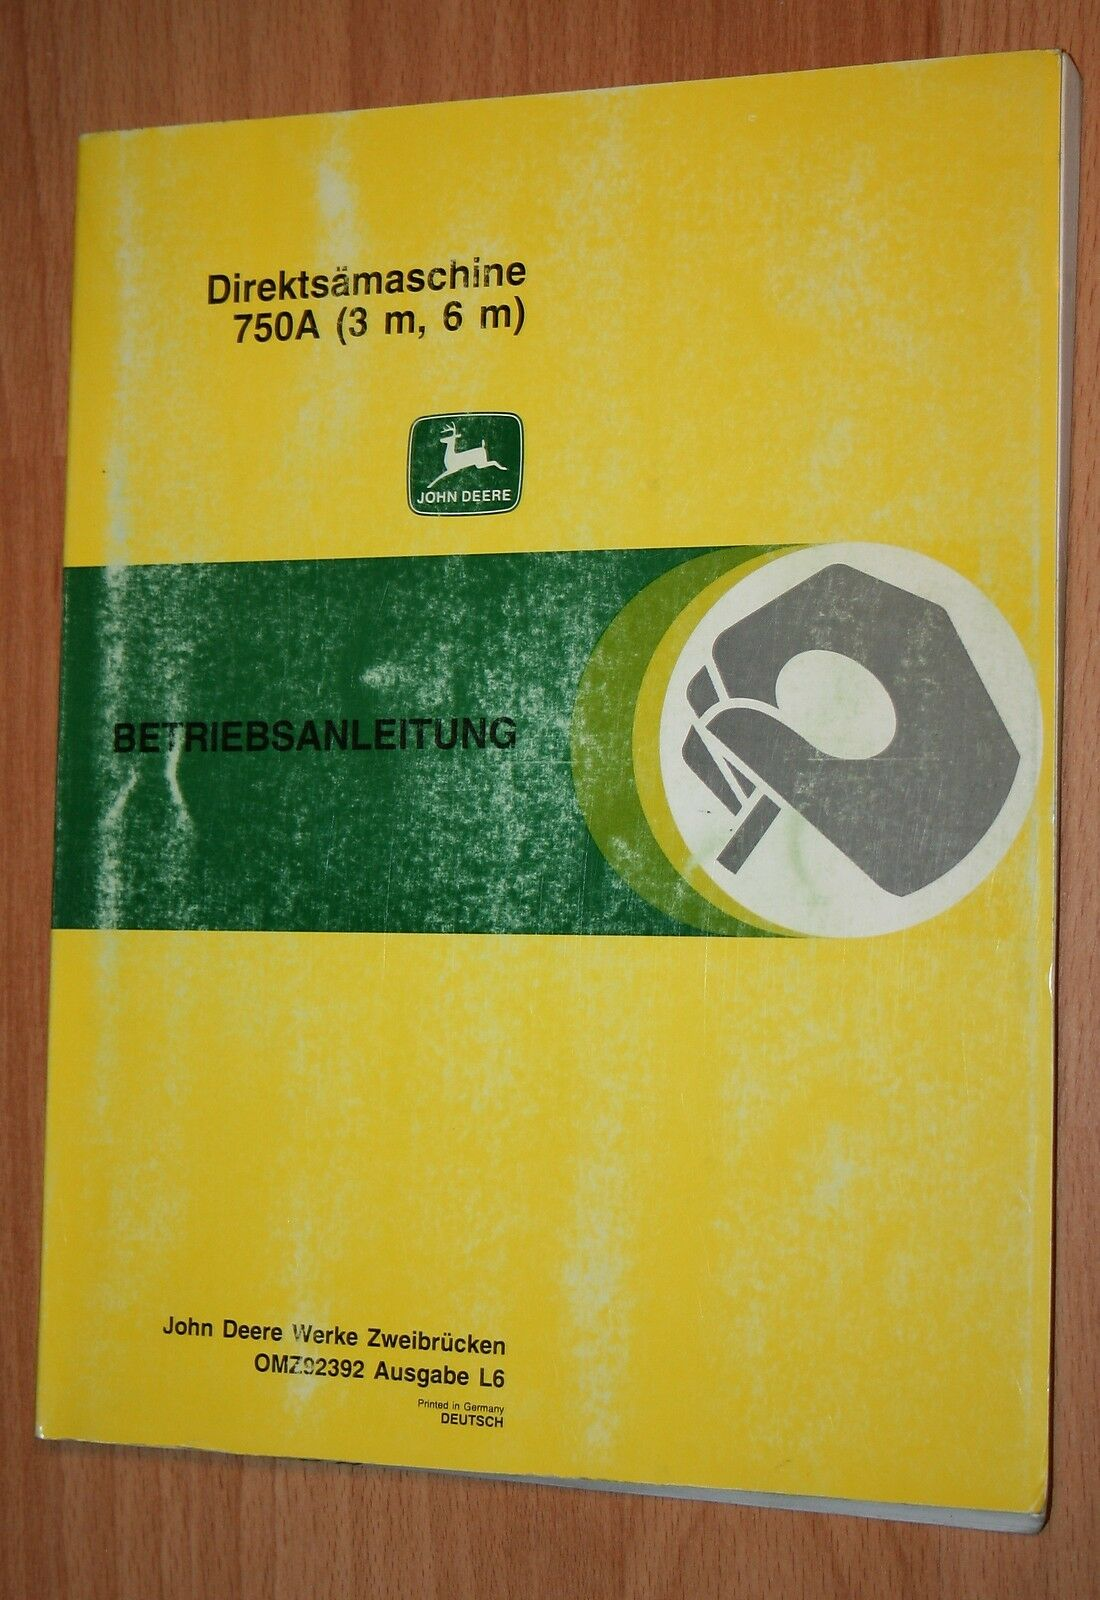 John Deere 80 Kleinschlepper Betriebsanleitung für Einachs-Kippanhänger